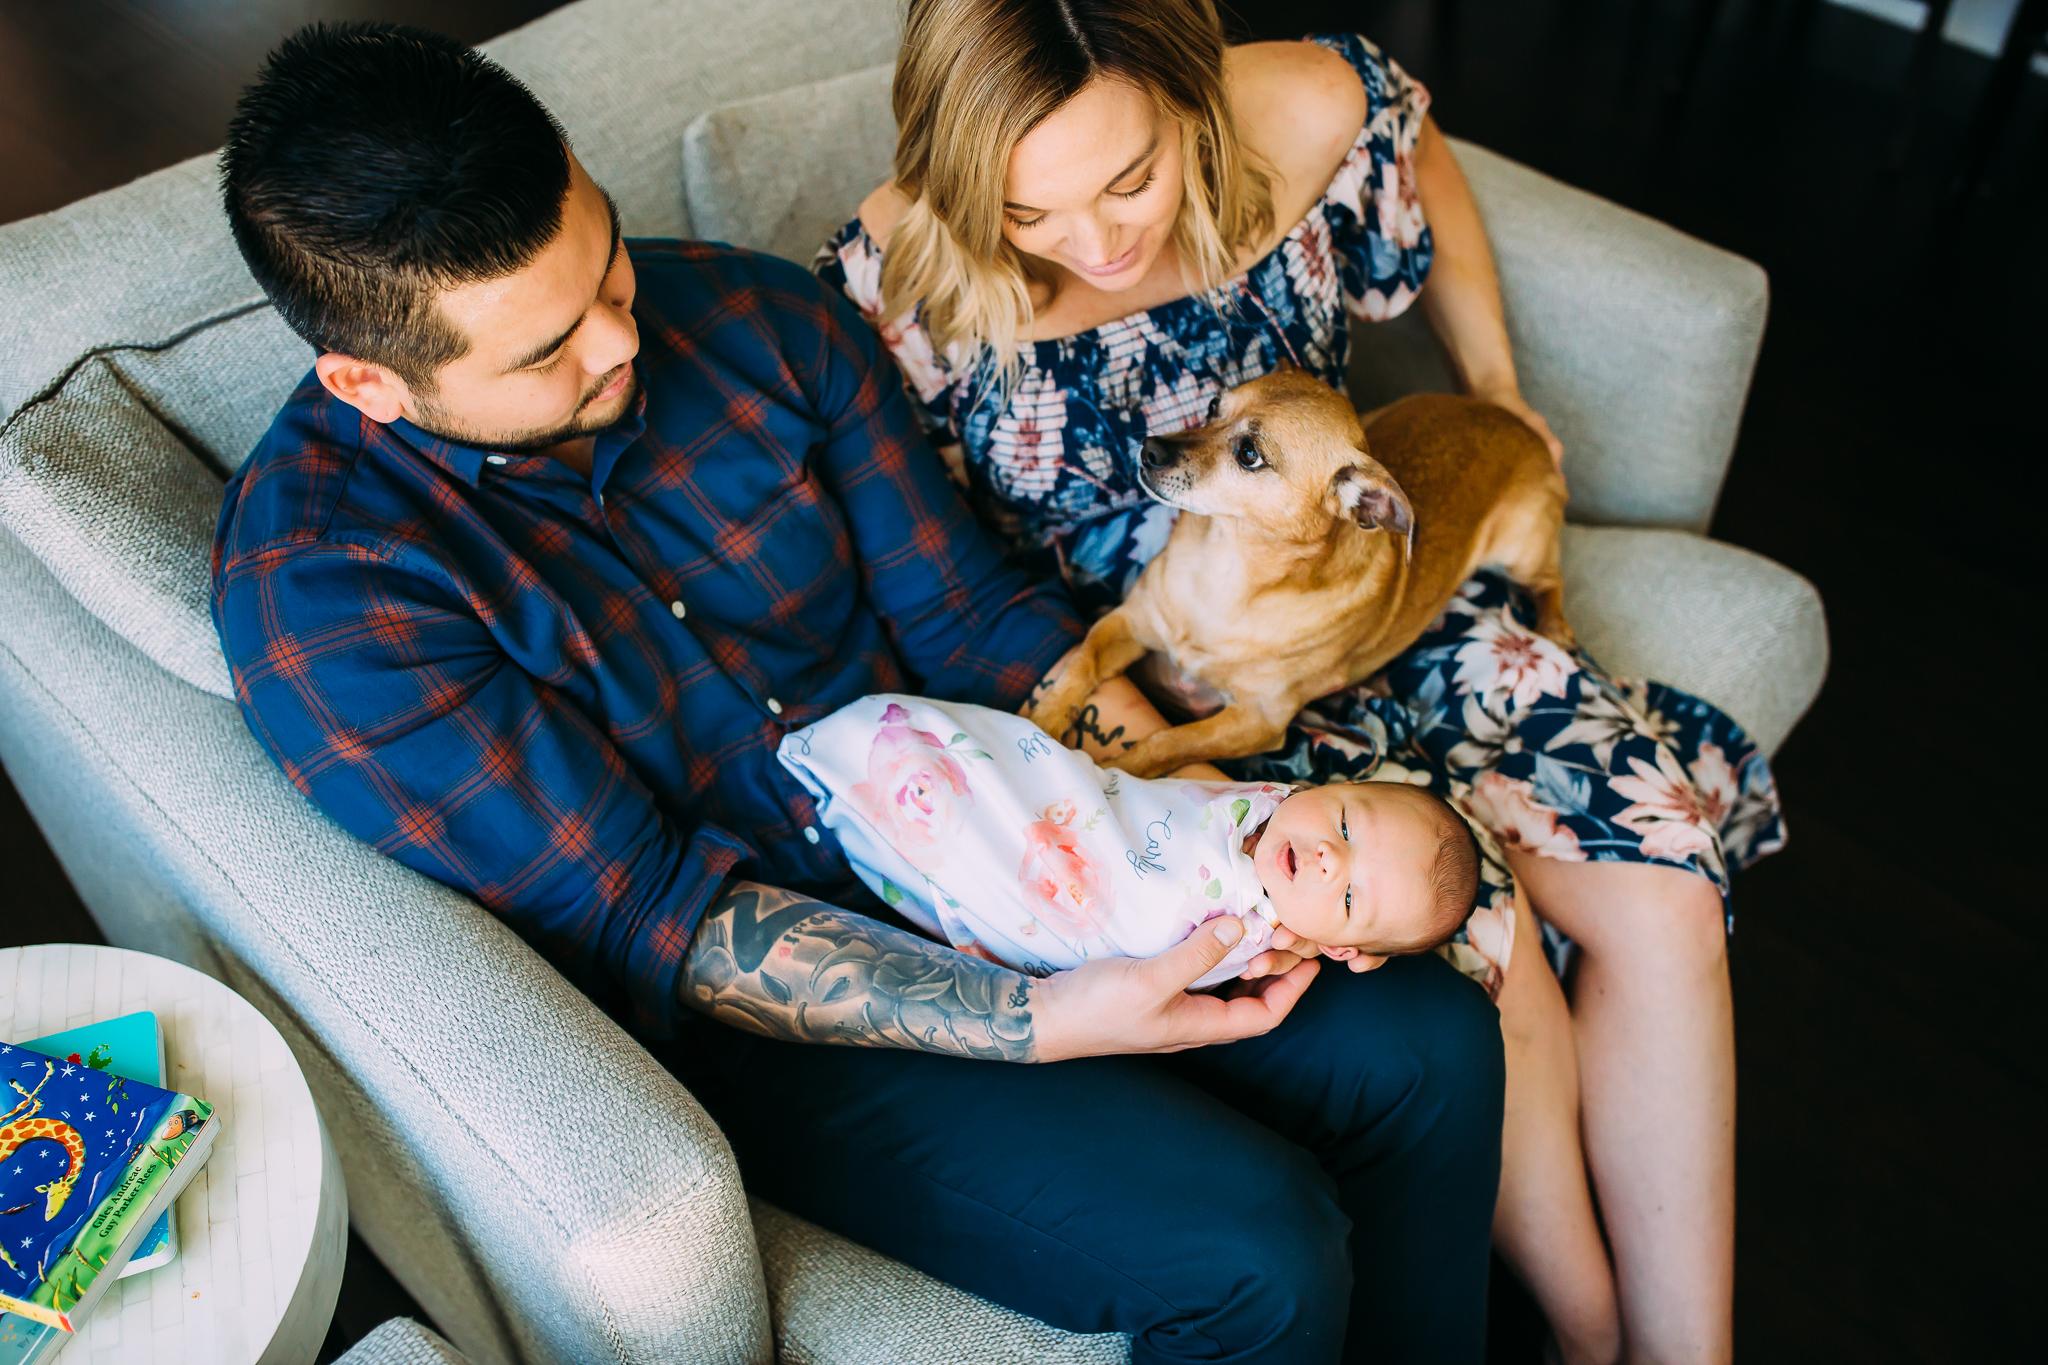 lifestyle newborn photo session in Orange County, CA